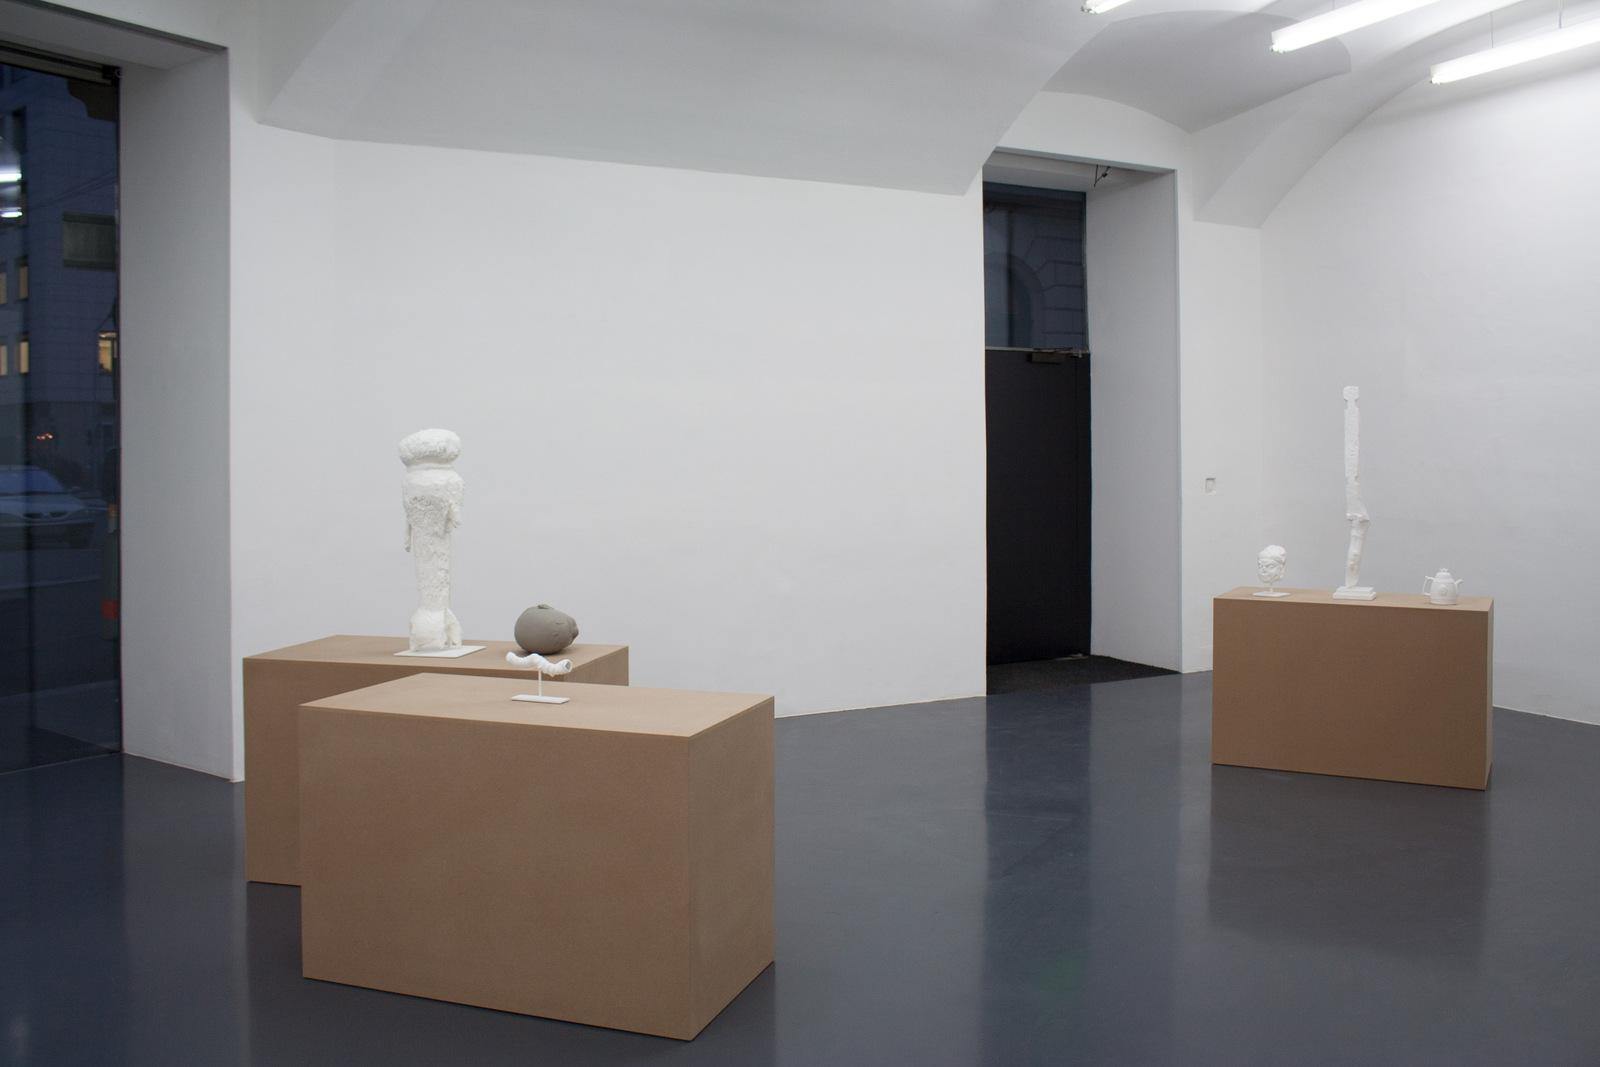 38 Gaylen Gerber exhibition Galerie Emanuel Layr Wien 2016 IMG_8750